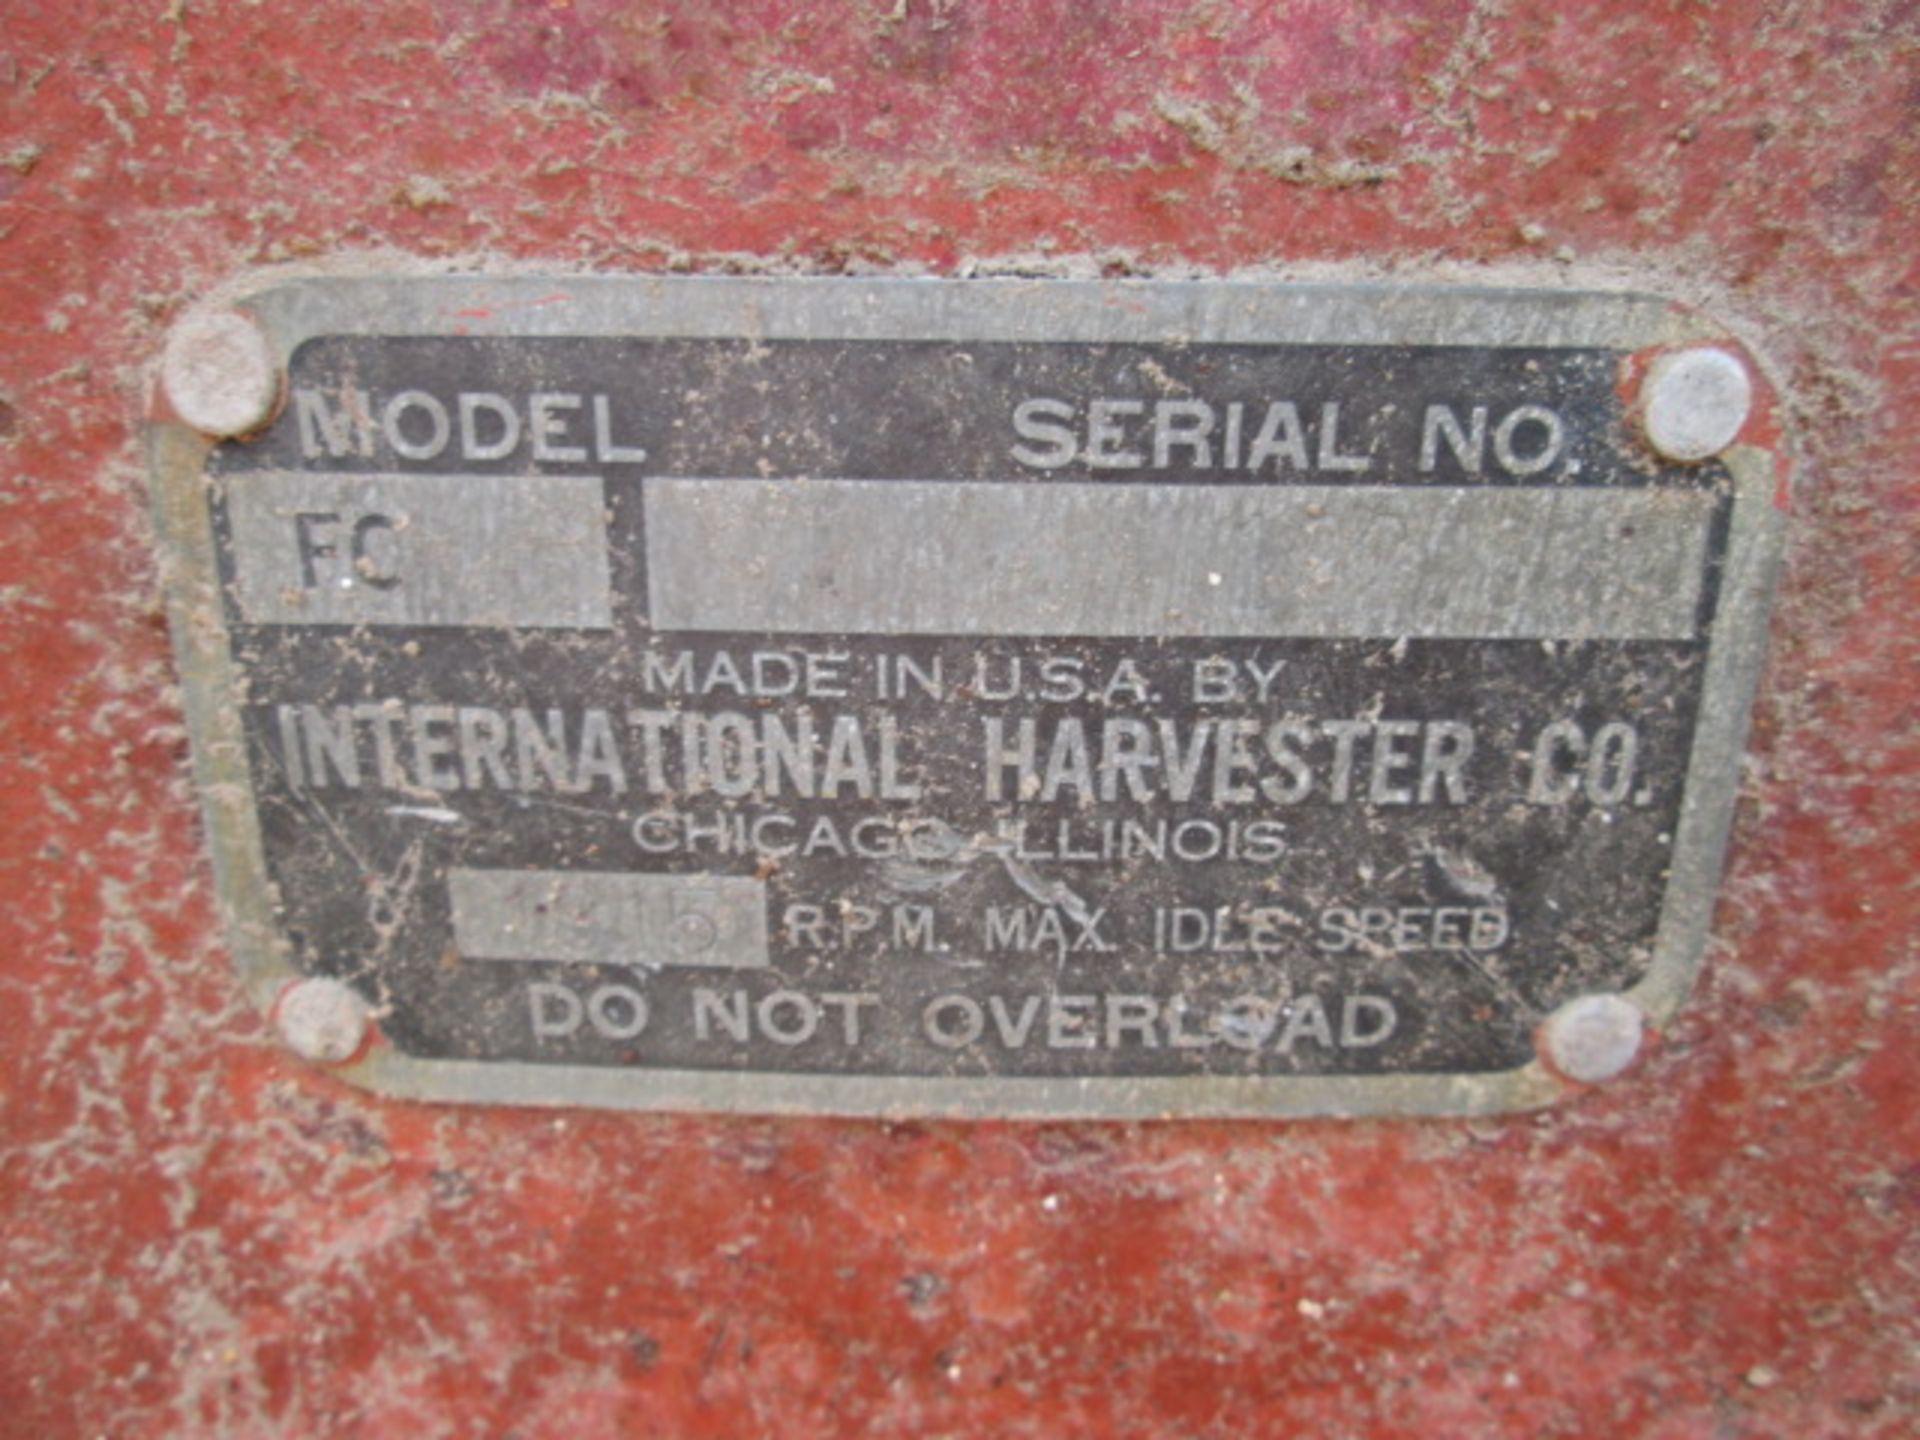 Lot 354 - FARMALL C, SN-12206, WOODS 59 MOWER, NON-RUNNING